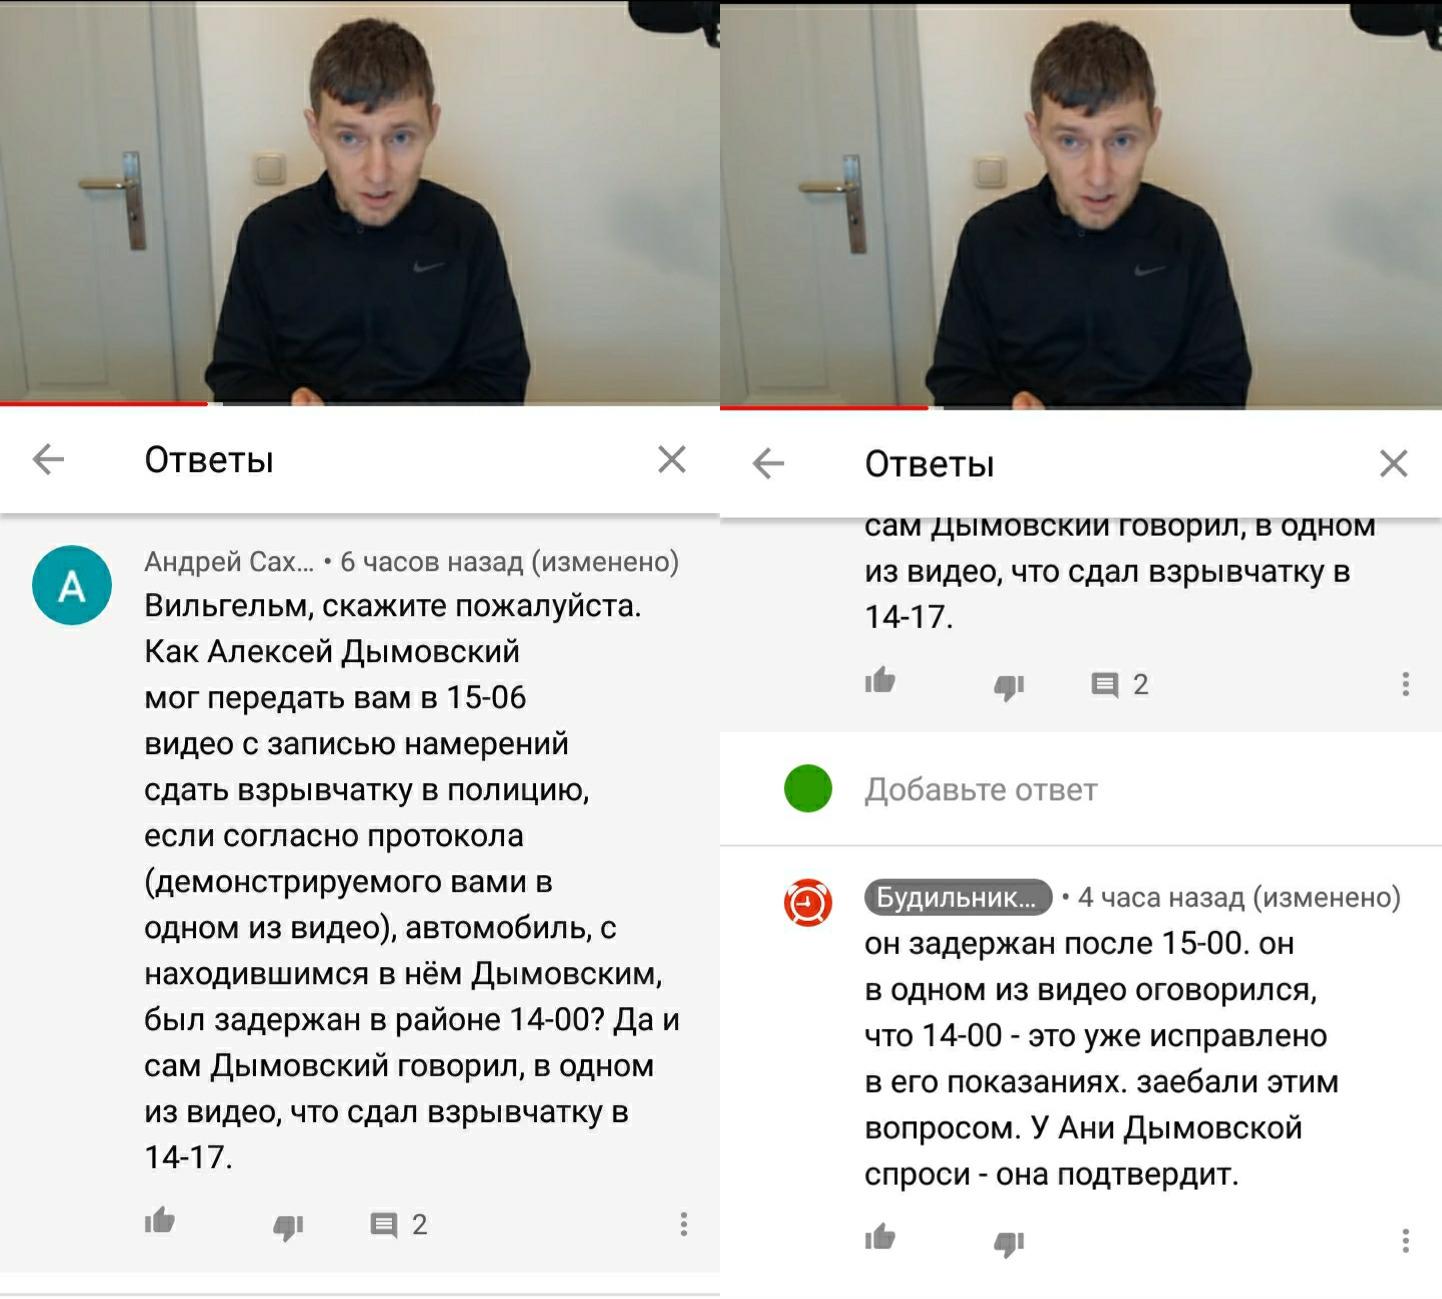 http://images.vfl.ru/ii/1583837125/3f204362/29827972.jpg